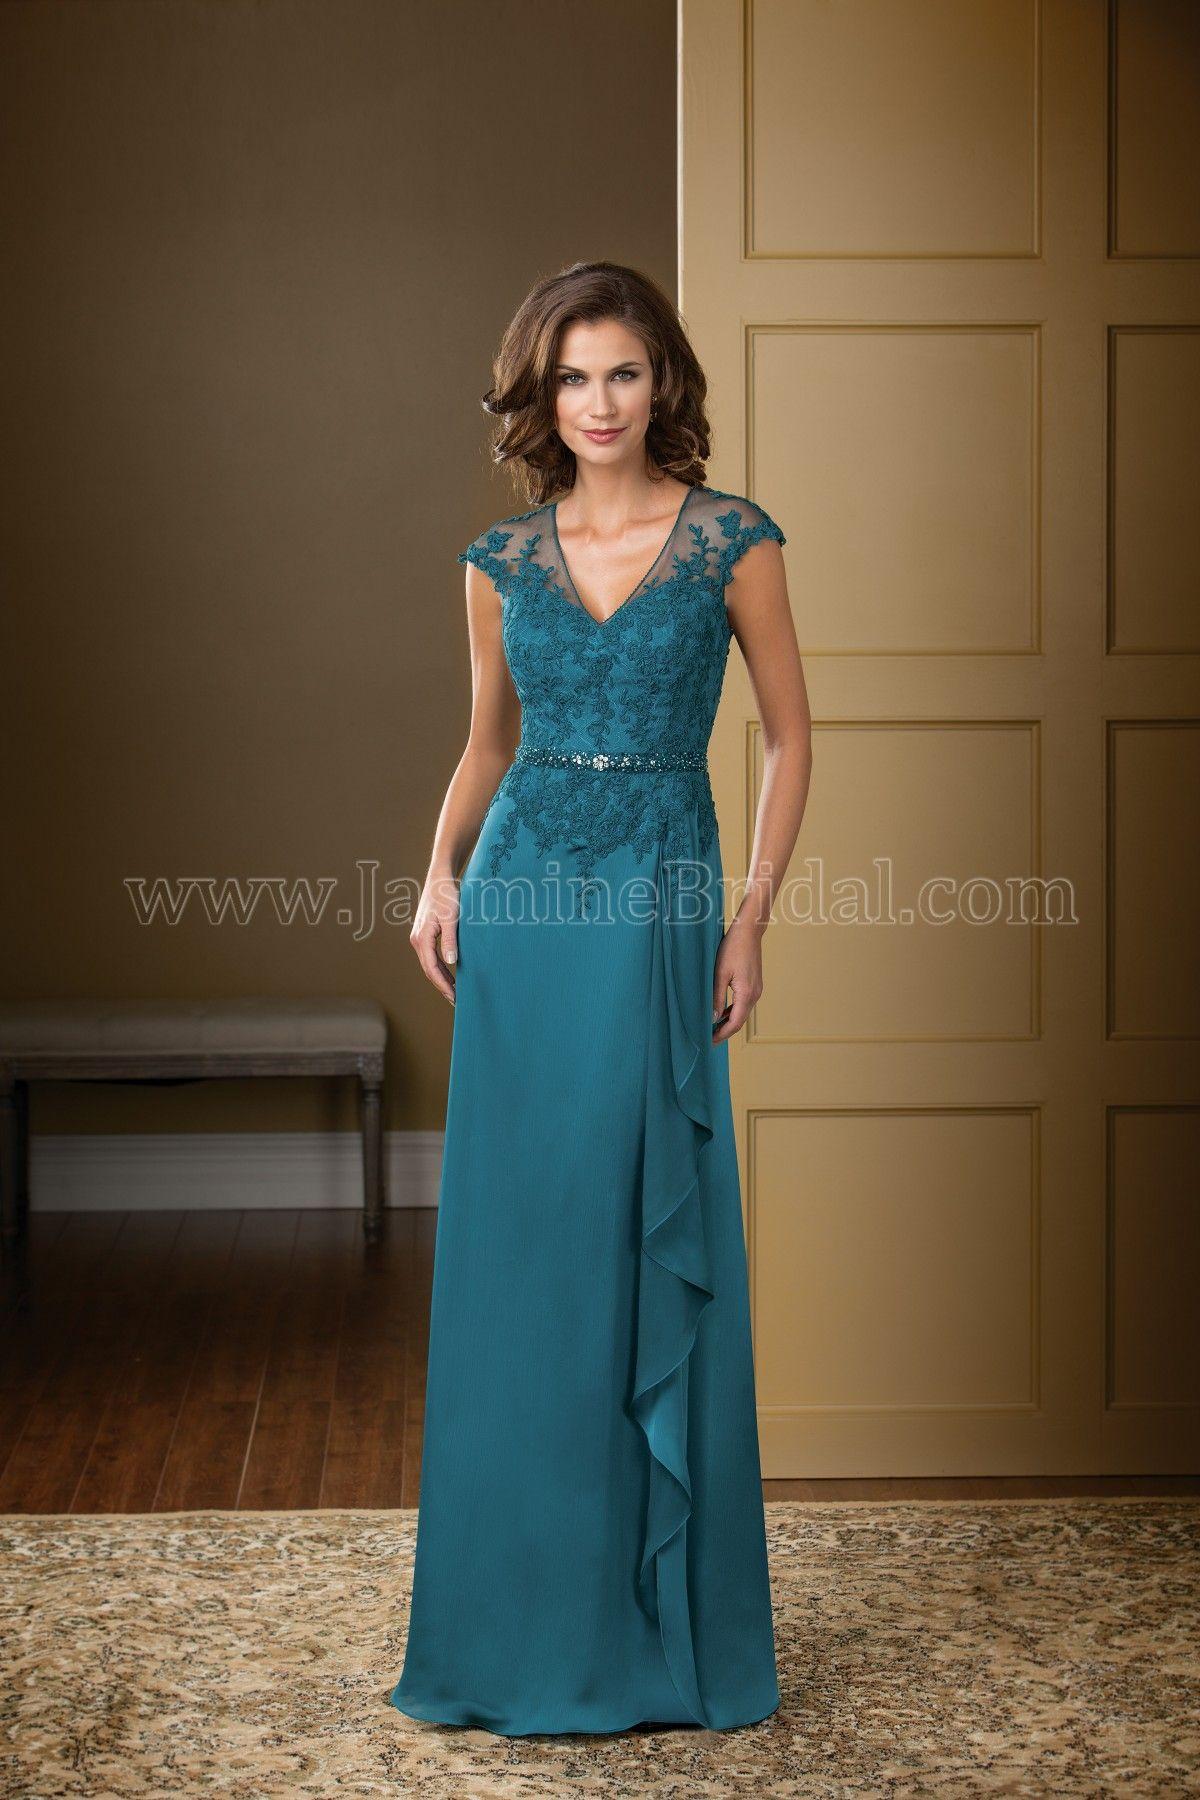 Jade Bridal Mother Dress